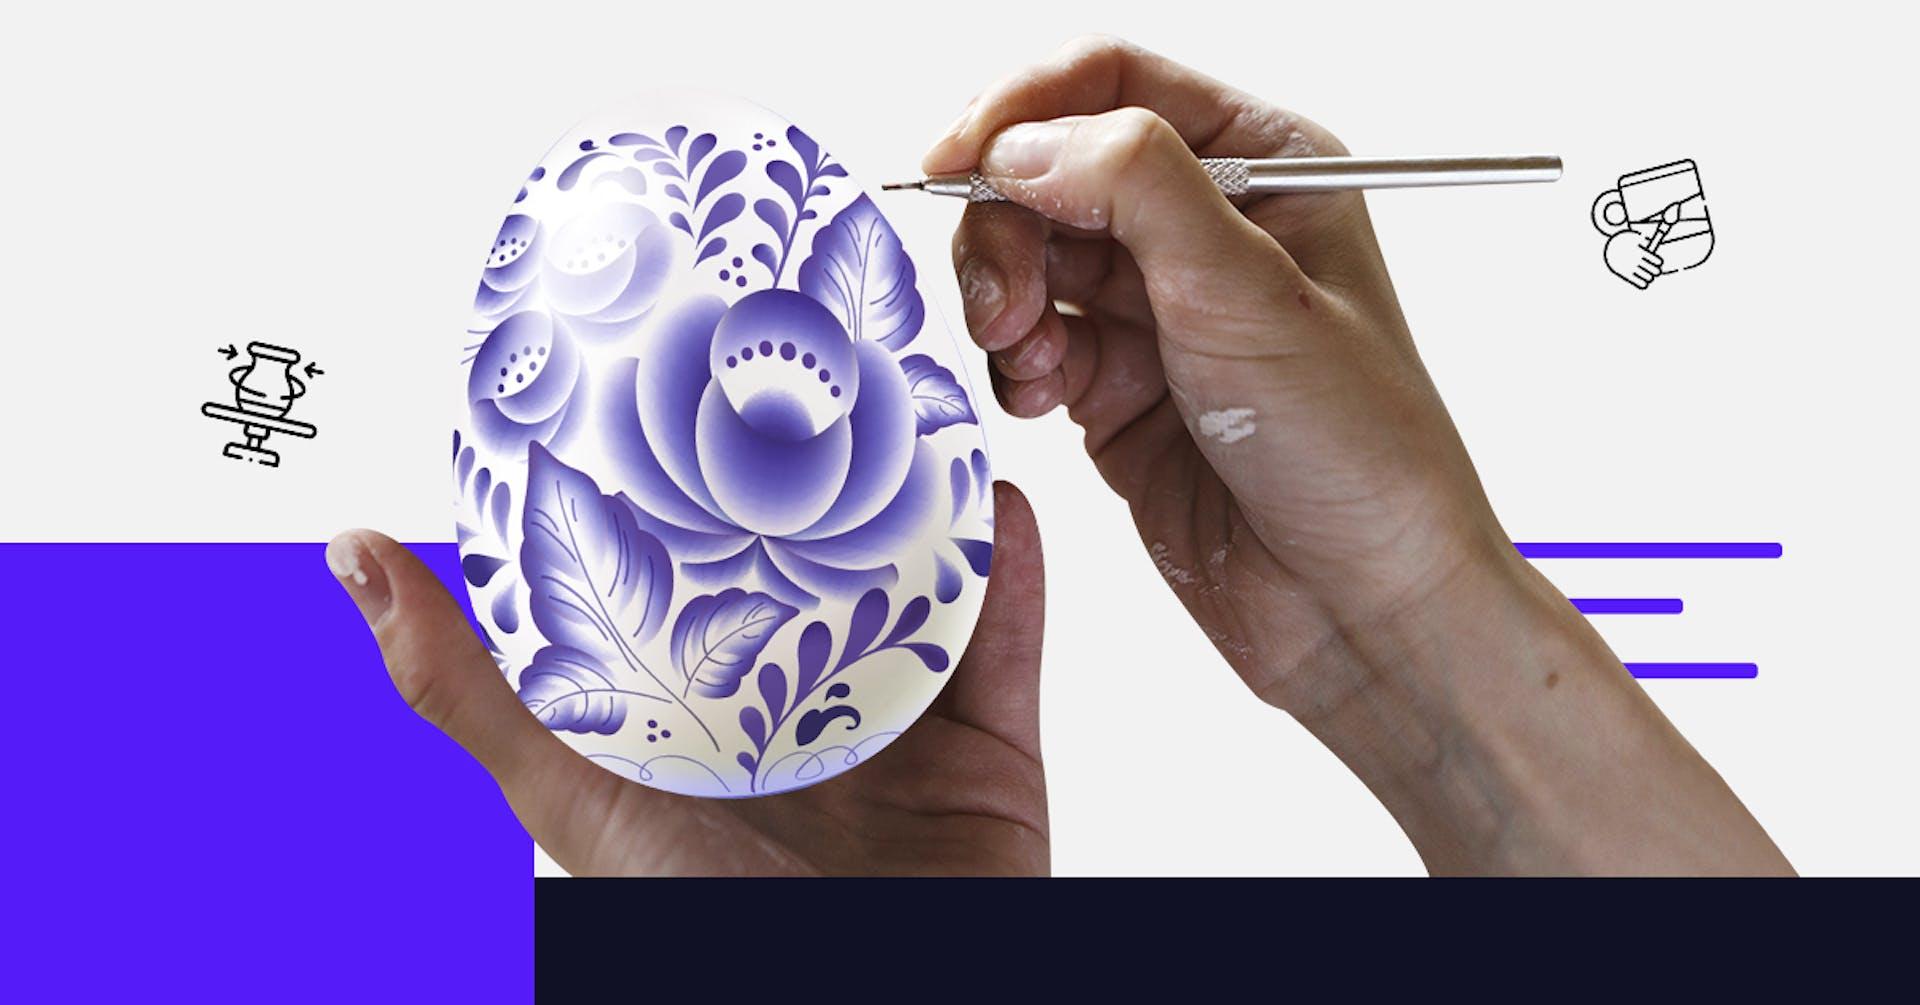 ¿Cómo lograr manualidades increíbles con porcelana fría sin ser un experto?